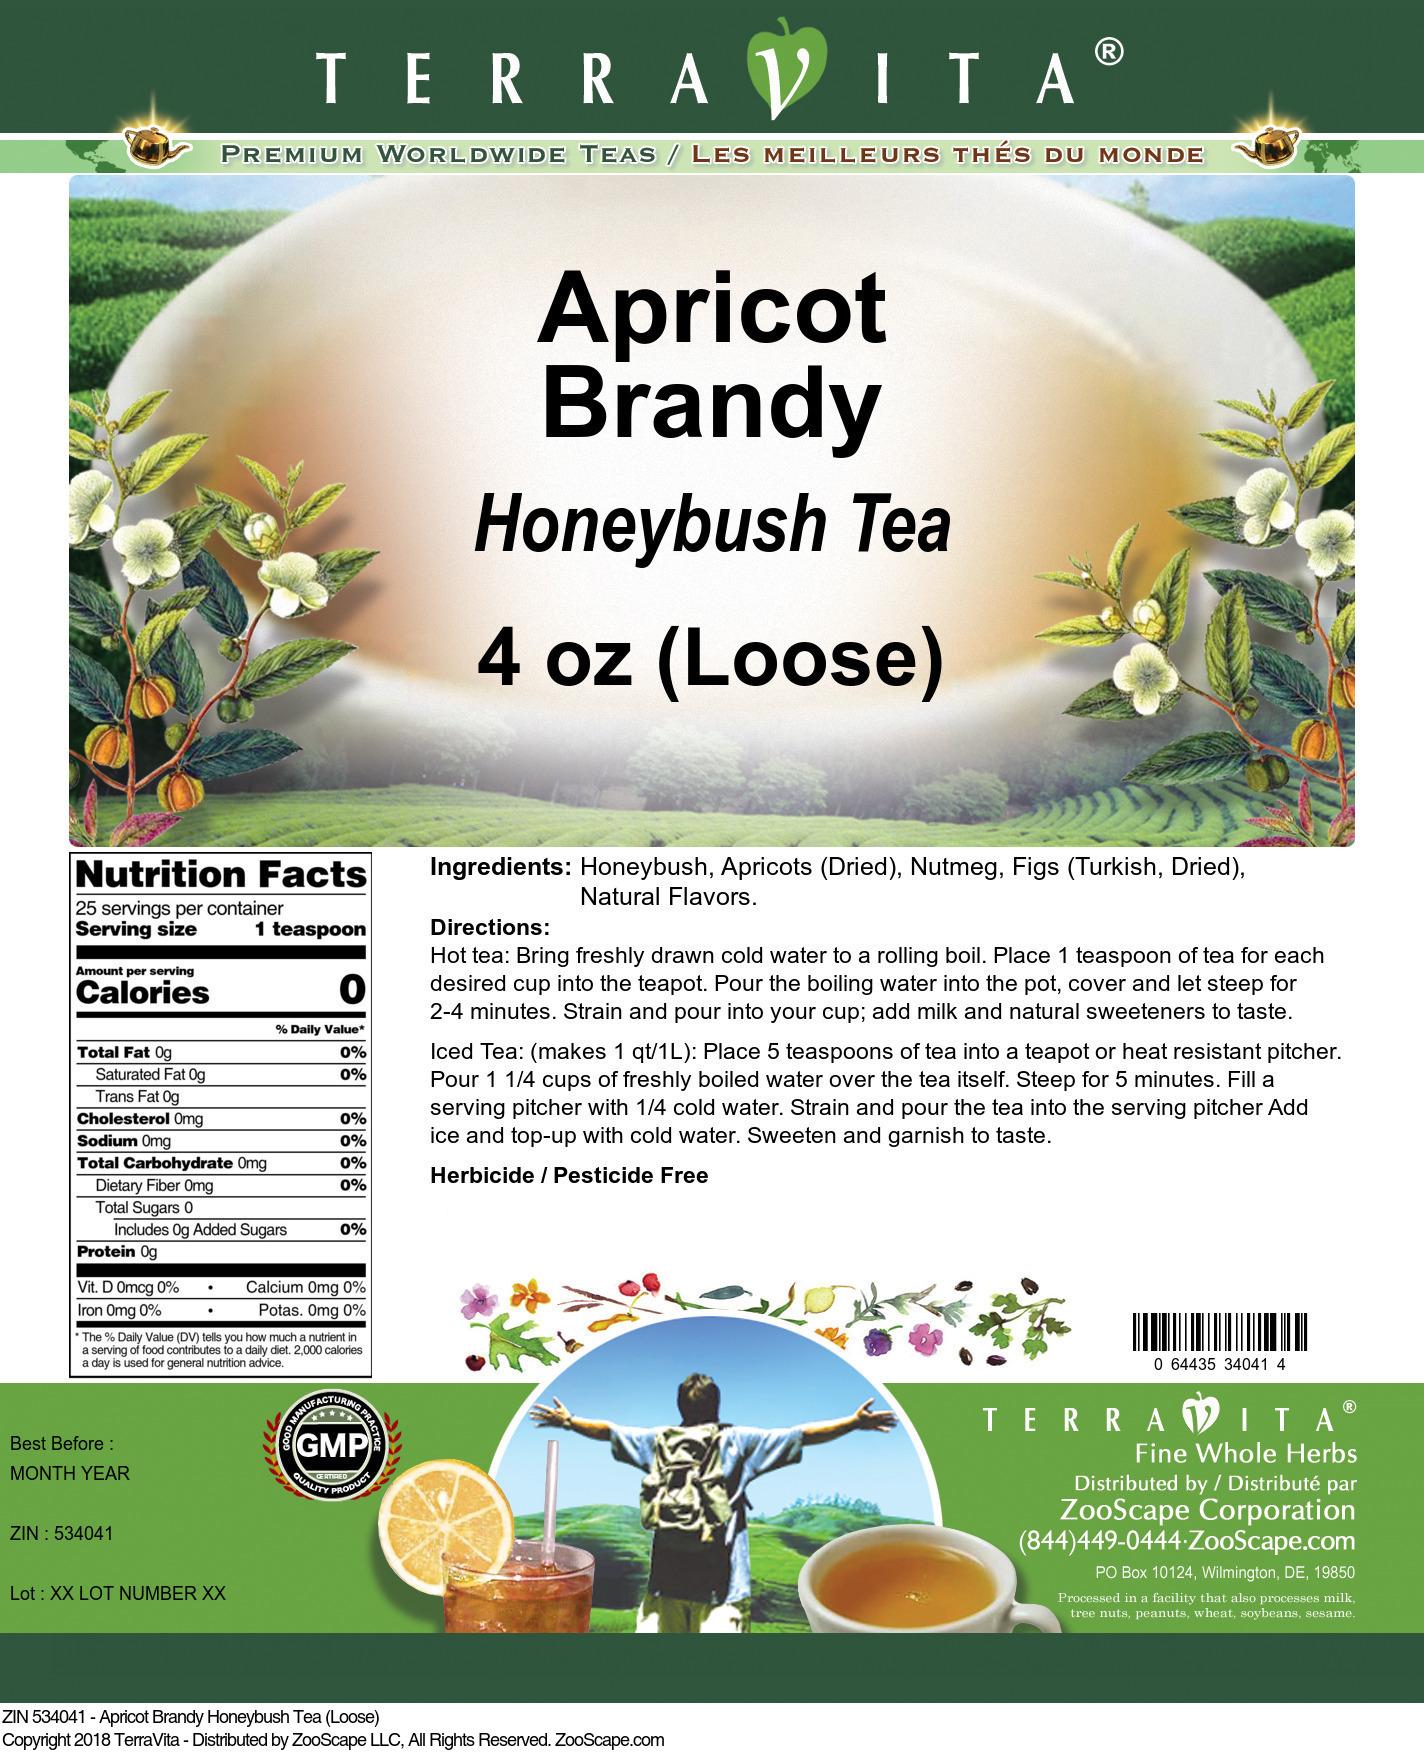 Apricot Brandy Honeybush Tea (Loose)